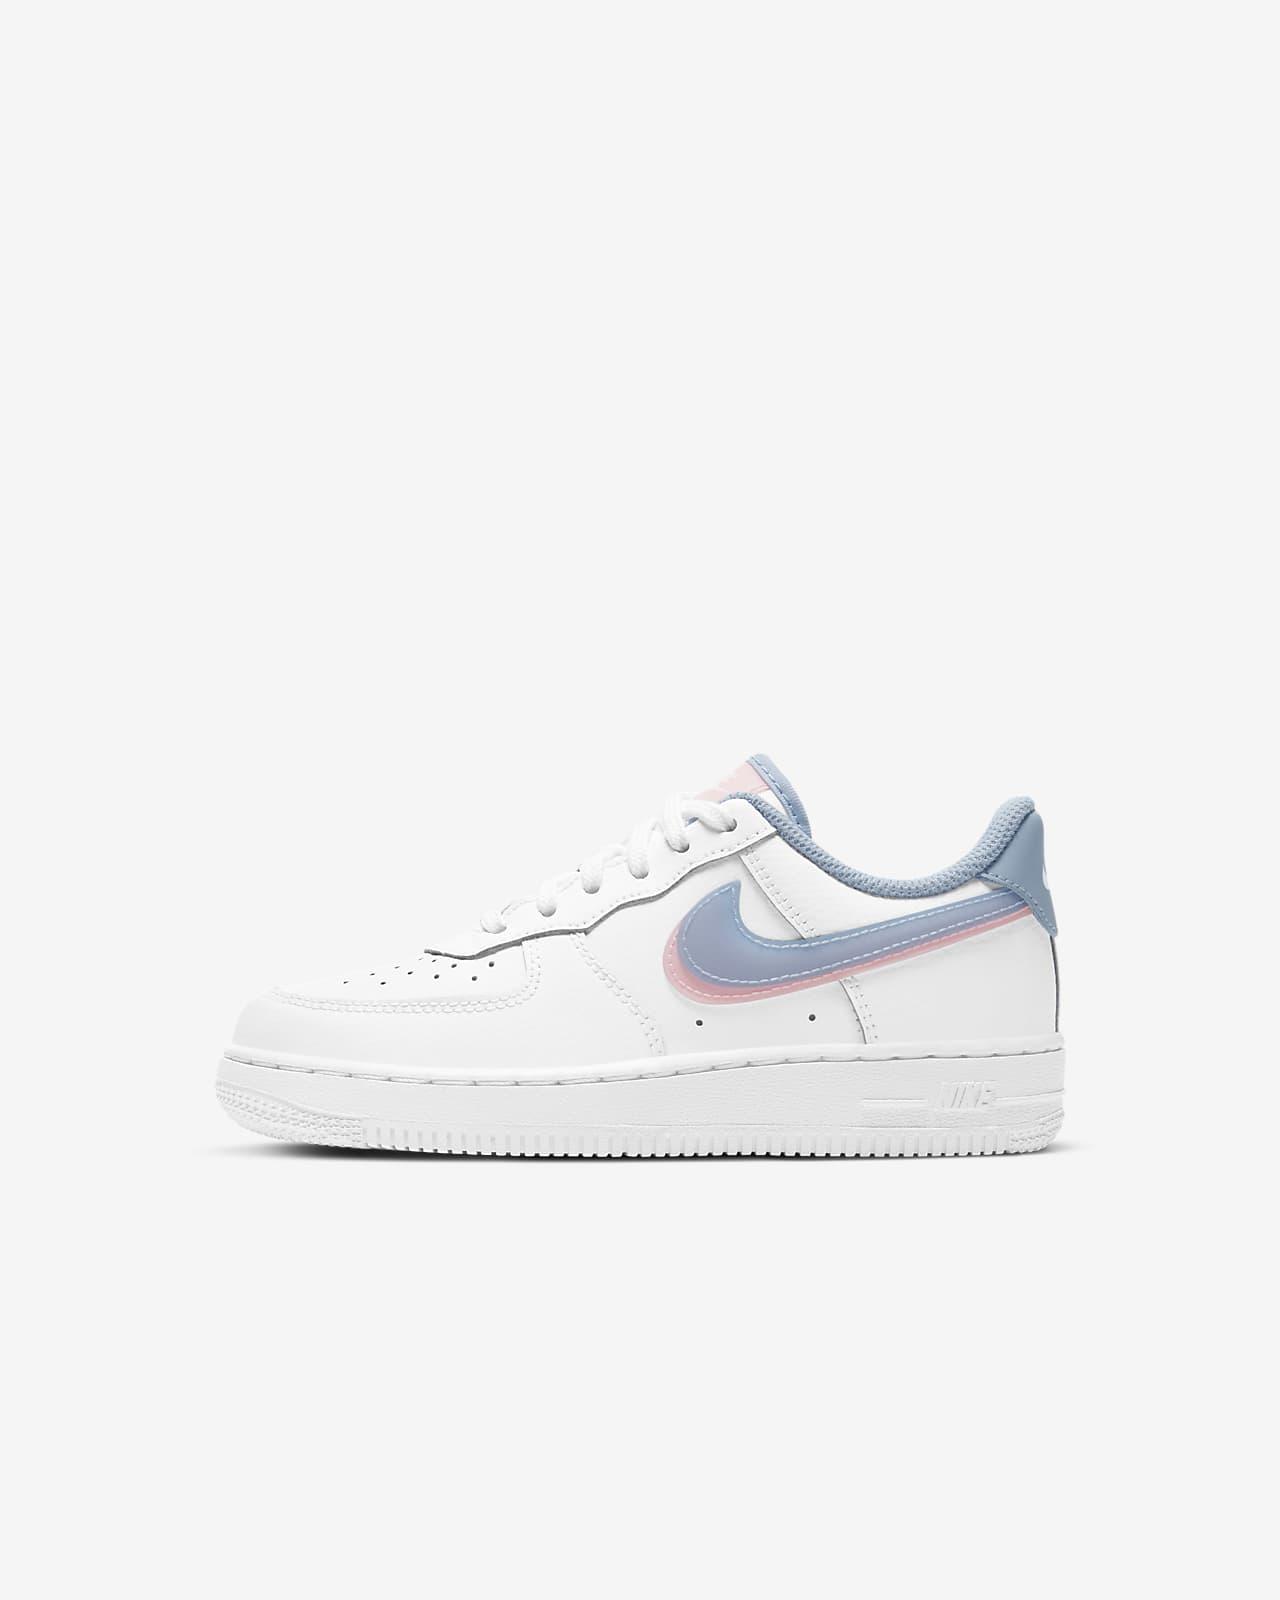 Nike Force 1 LV8 (PS) 幼童运动童鞋